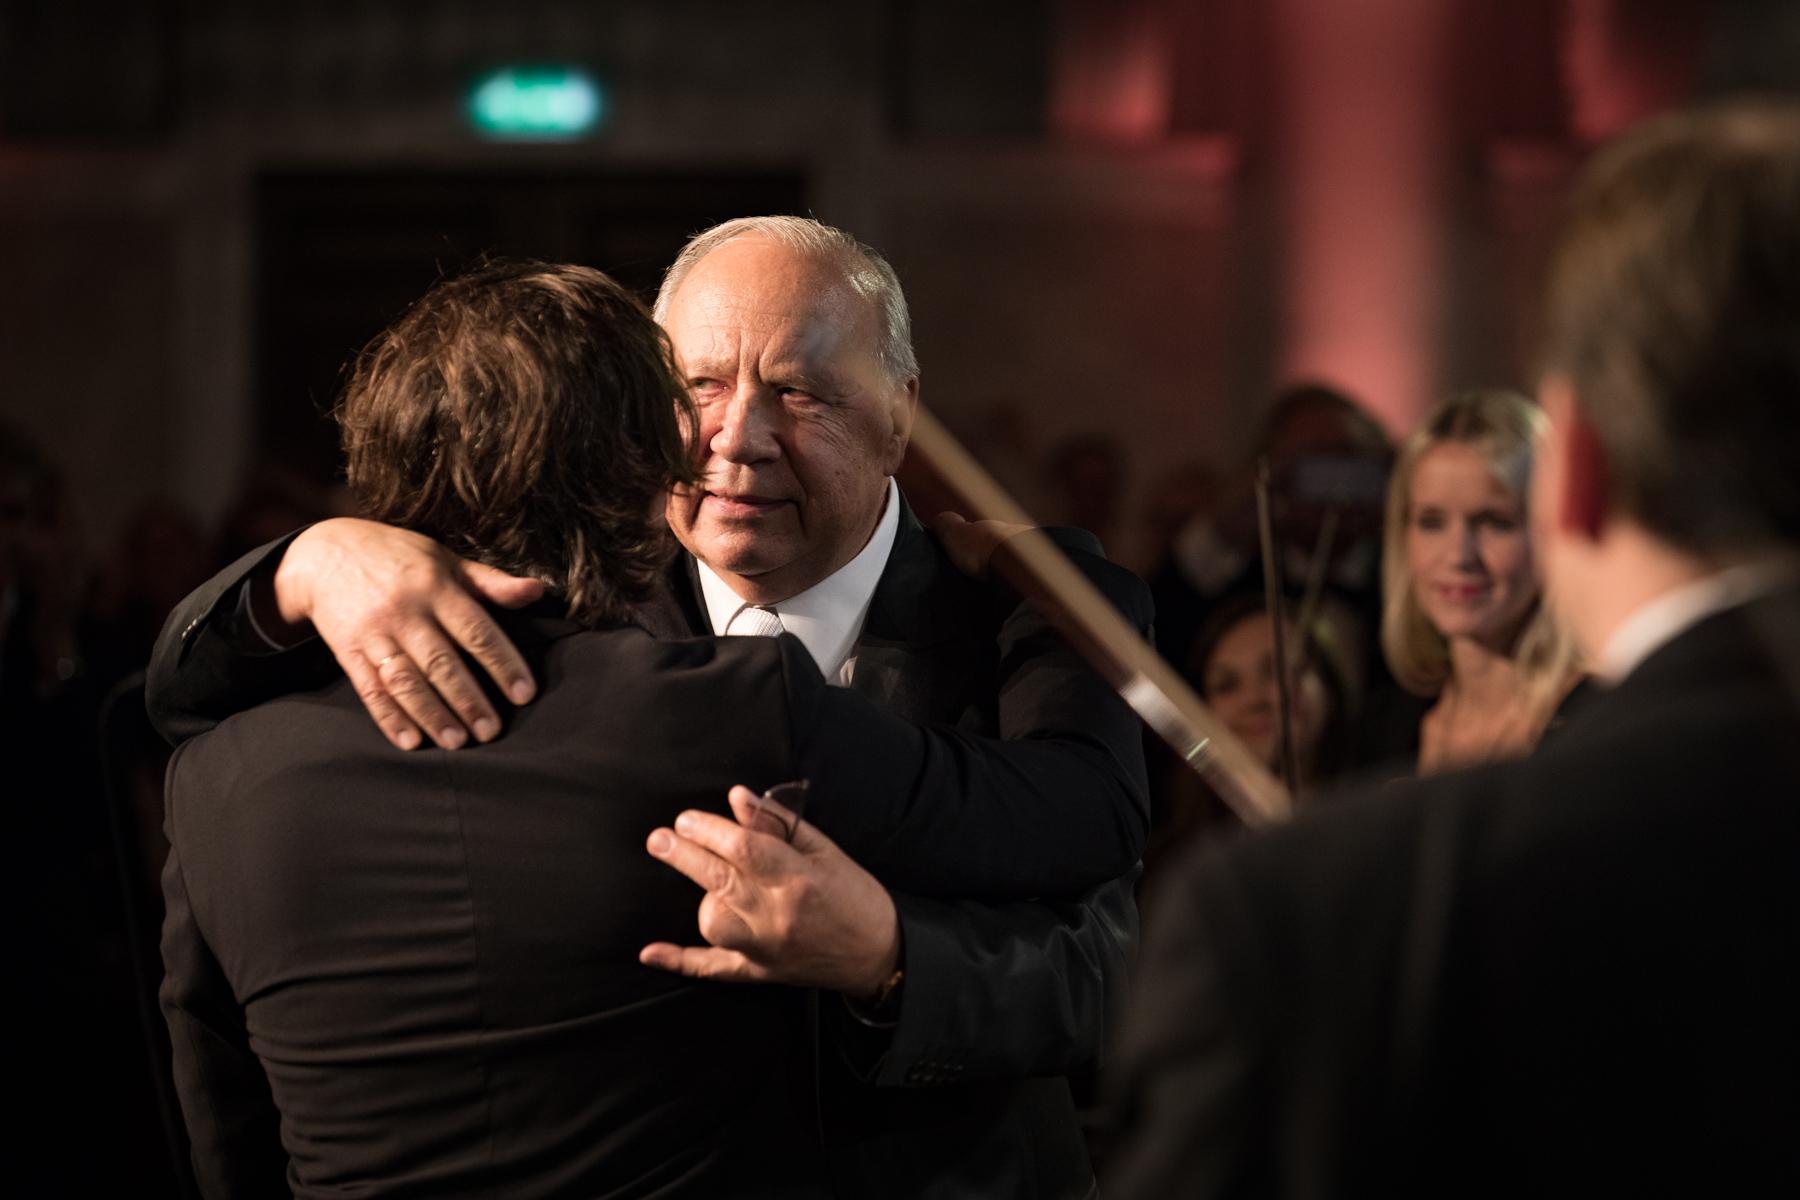 The Lifetime Achievement Award winner Neeme Järvi embraces his son, Kristjan